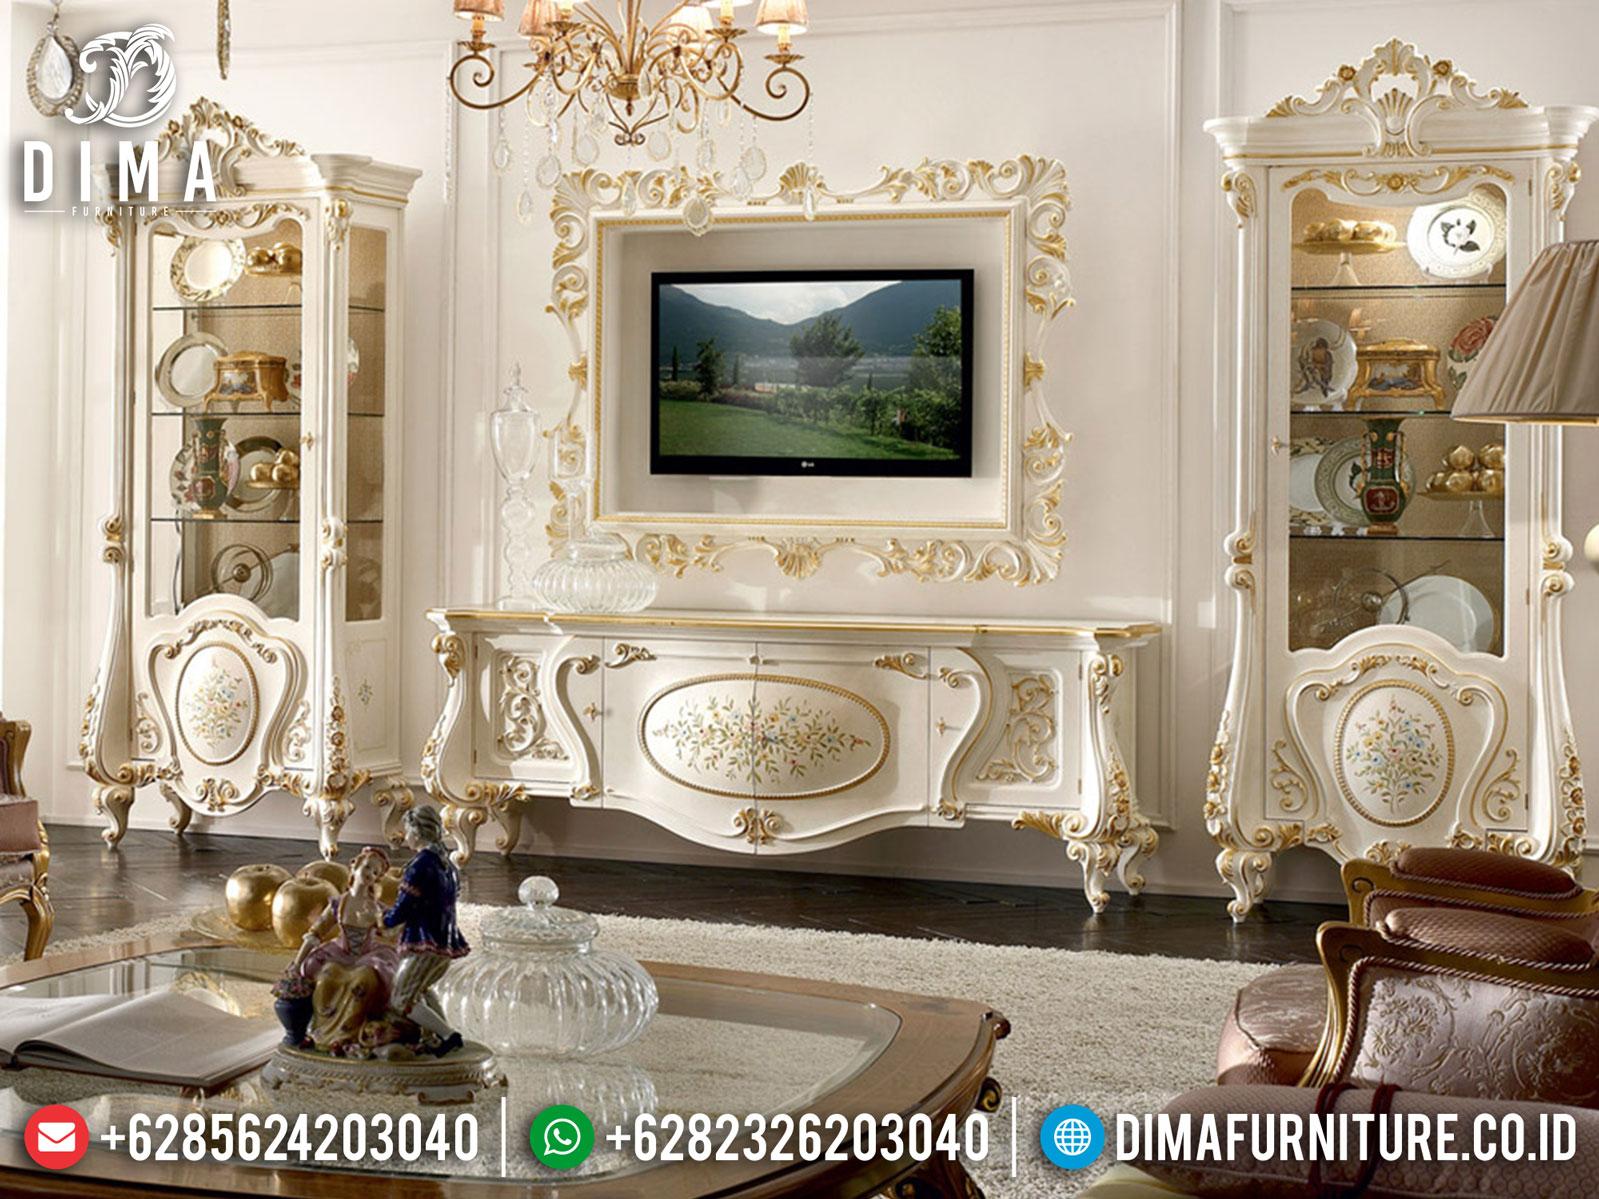 Harga Lemari Hias Kaca Mewah Set Meja TV Luxury White Duco Classic Carving Jepara TTJ-1032